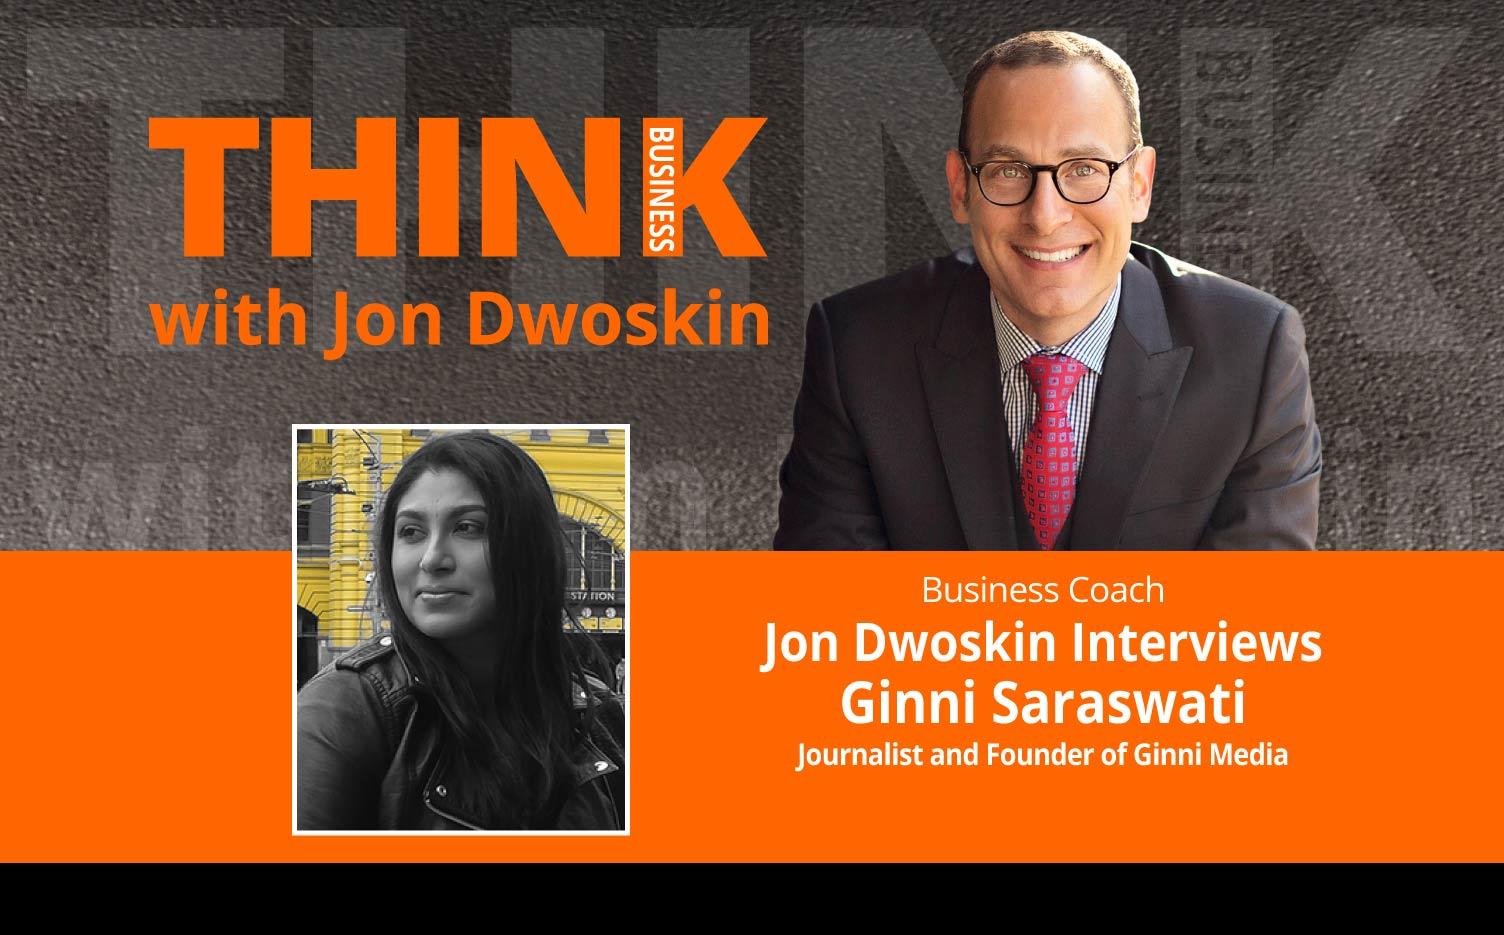 THINK Business Podcast: Jon Dwoskin Interviews Ginni Saraswati, Journalist and Founder of Ginni Media